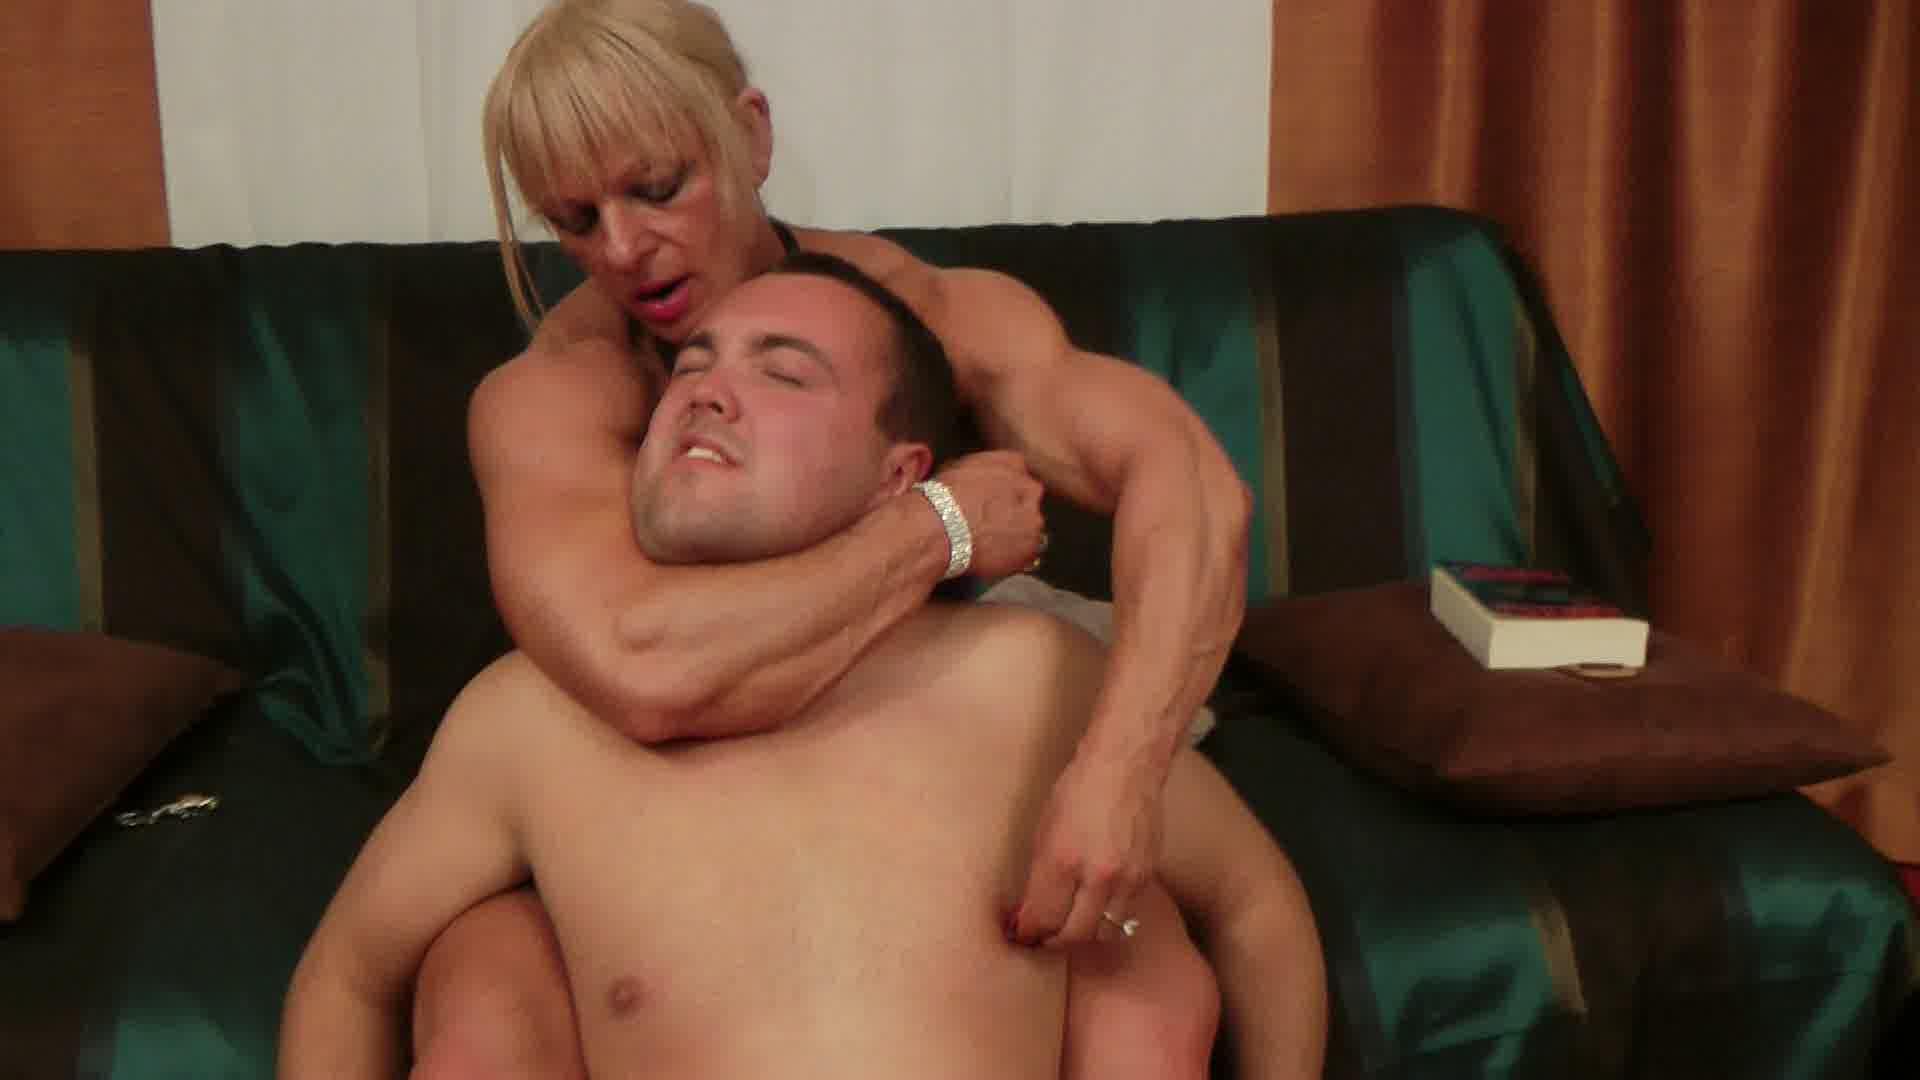 Senior viagra erections